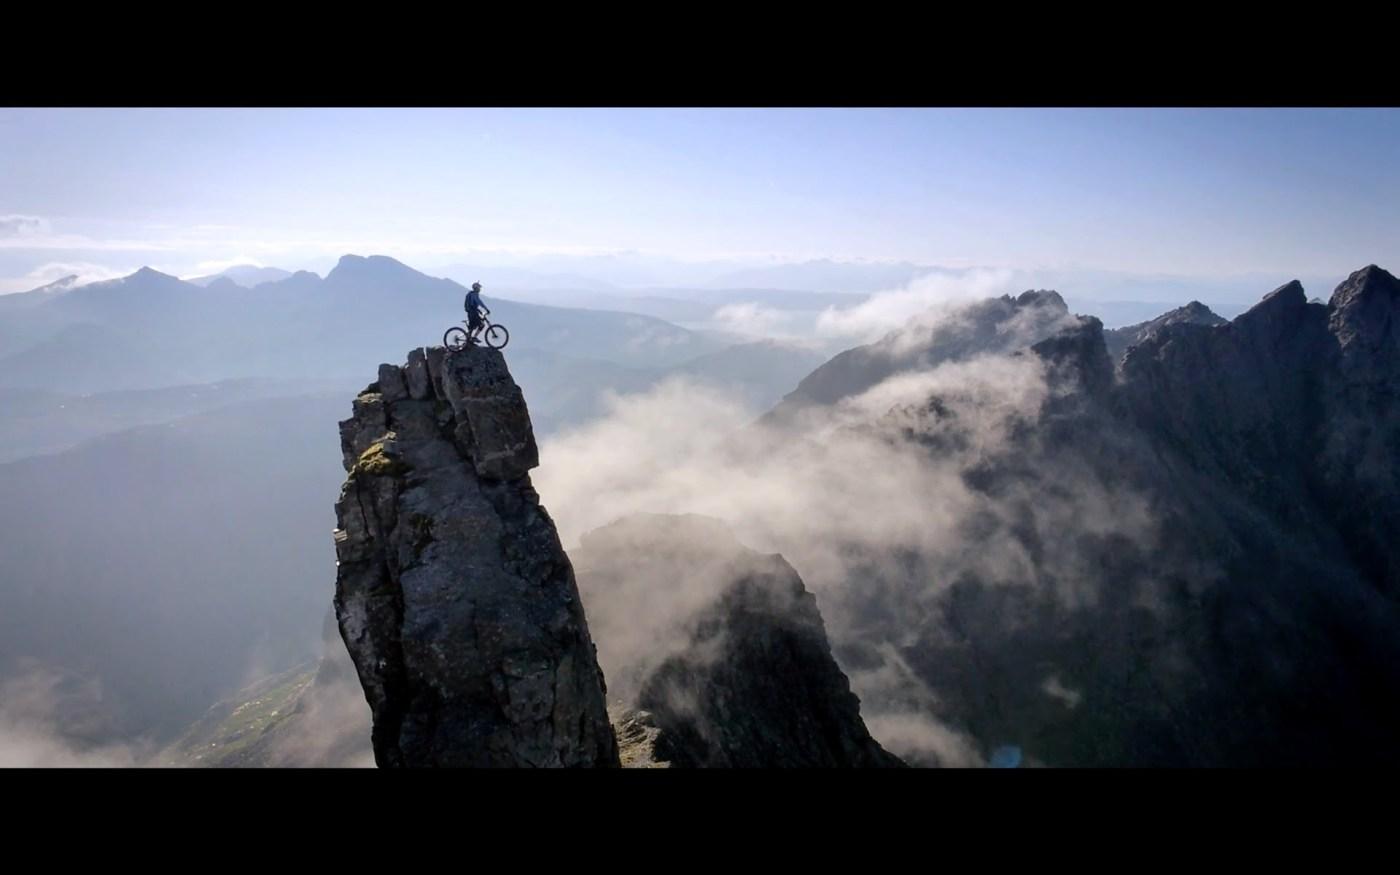 Danny Macaskill -- The Ridge 12